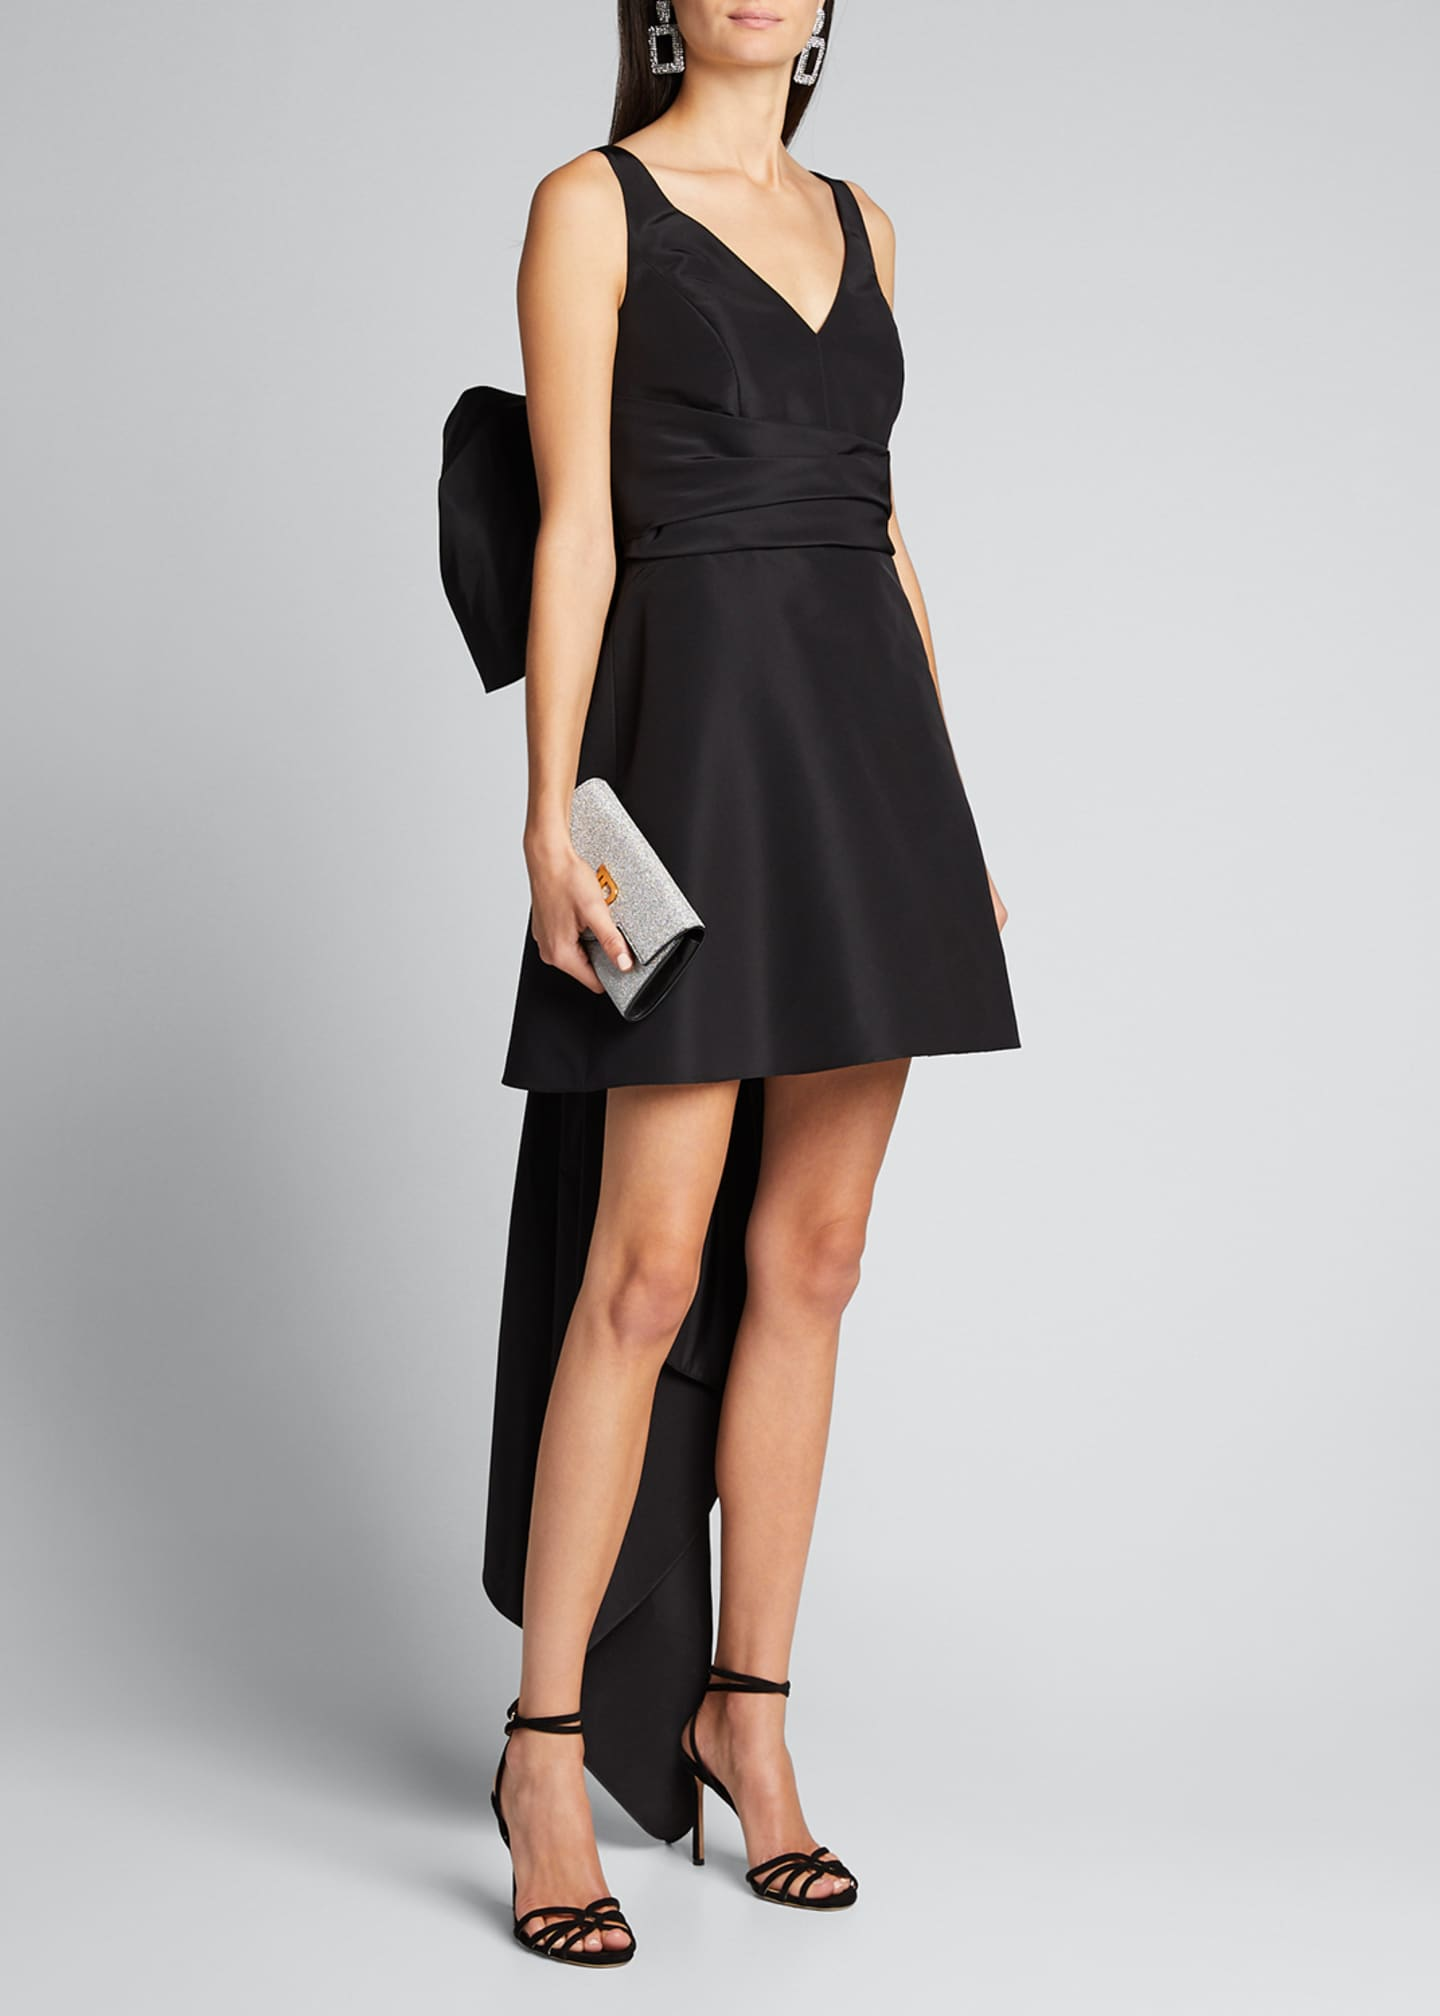 Carolina Herrera V-Neck A-Line Mini Dress w/ Back